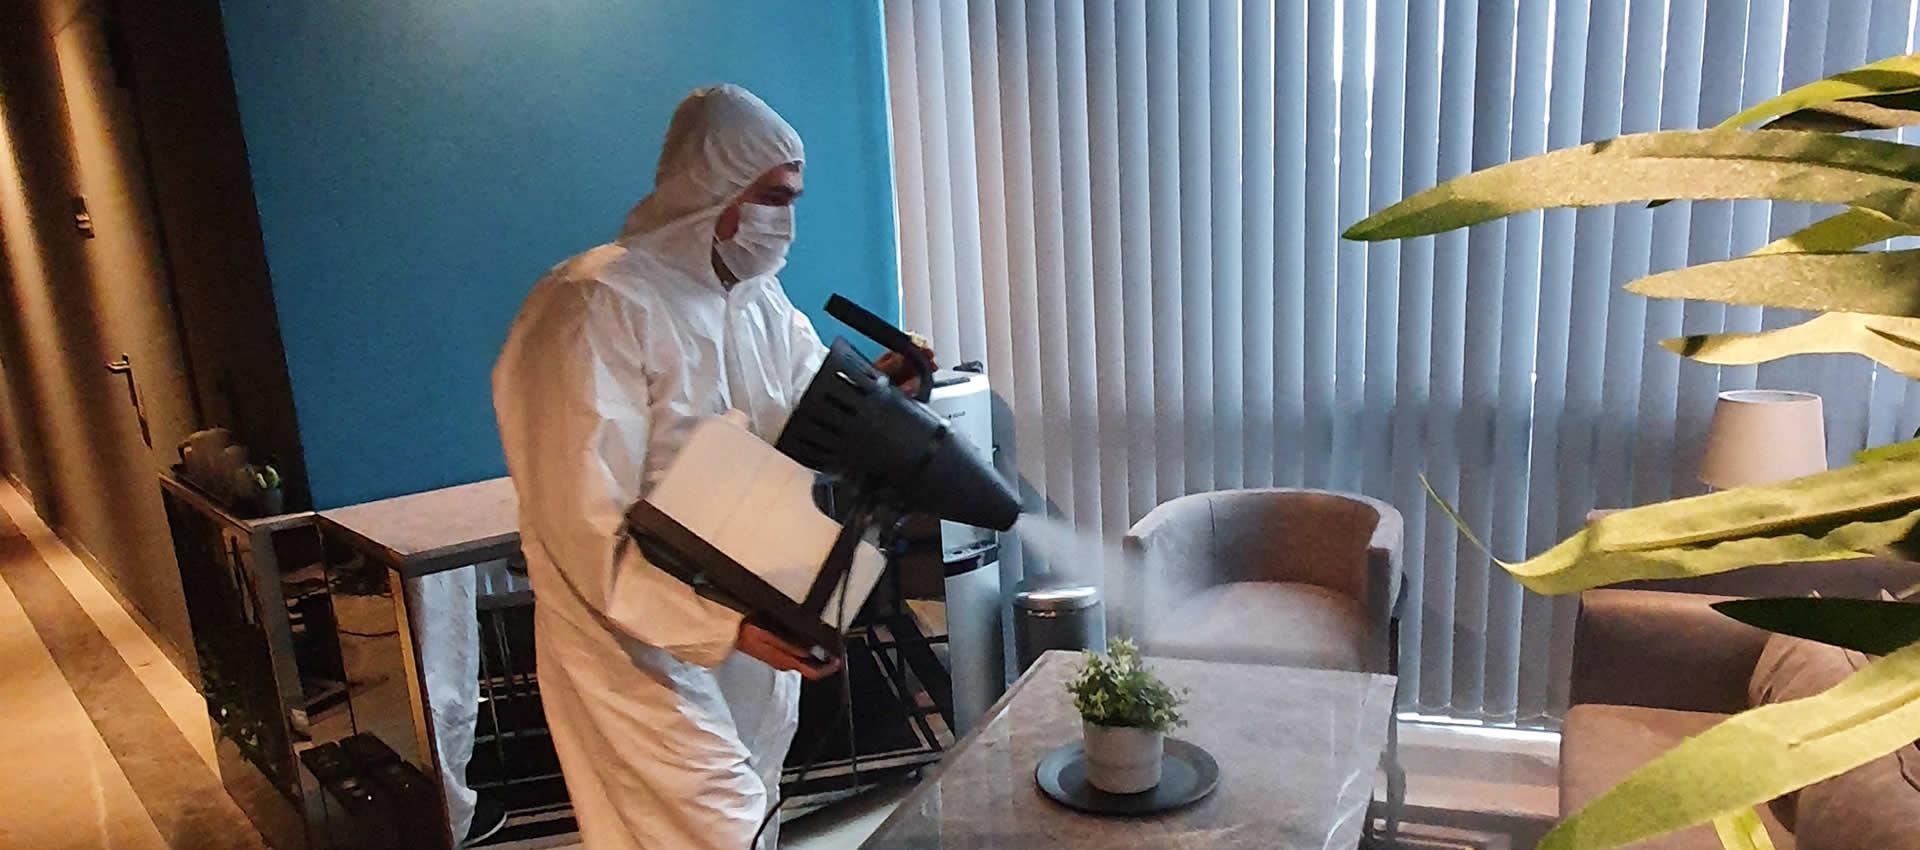 Virüslere Karşı Dezenfektasyon İşlemi